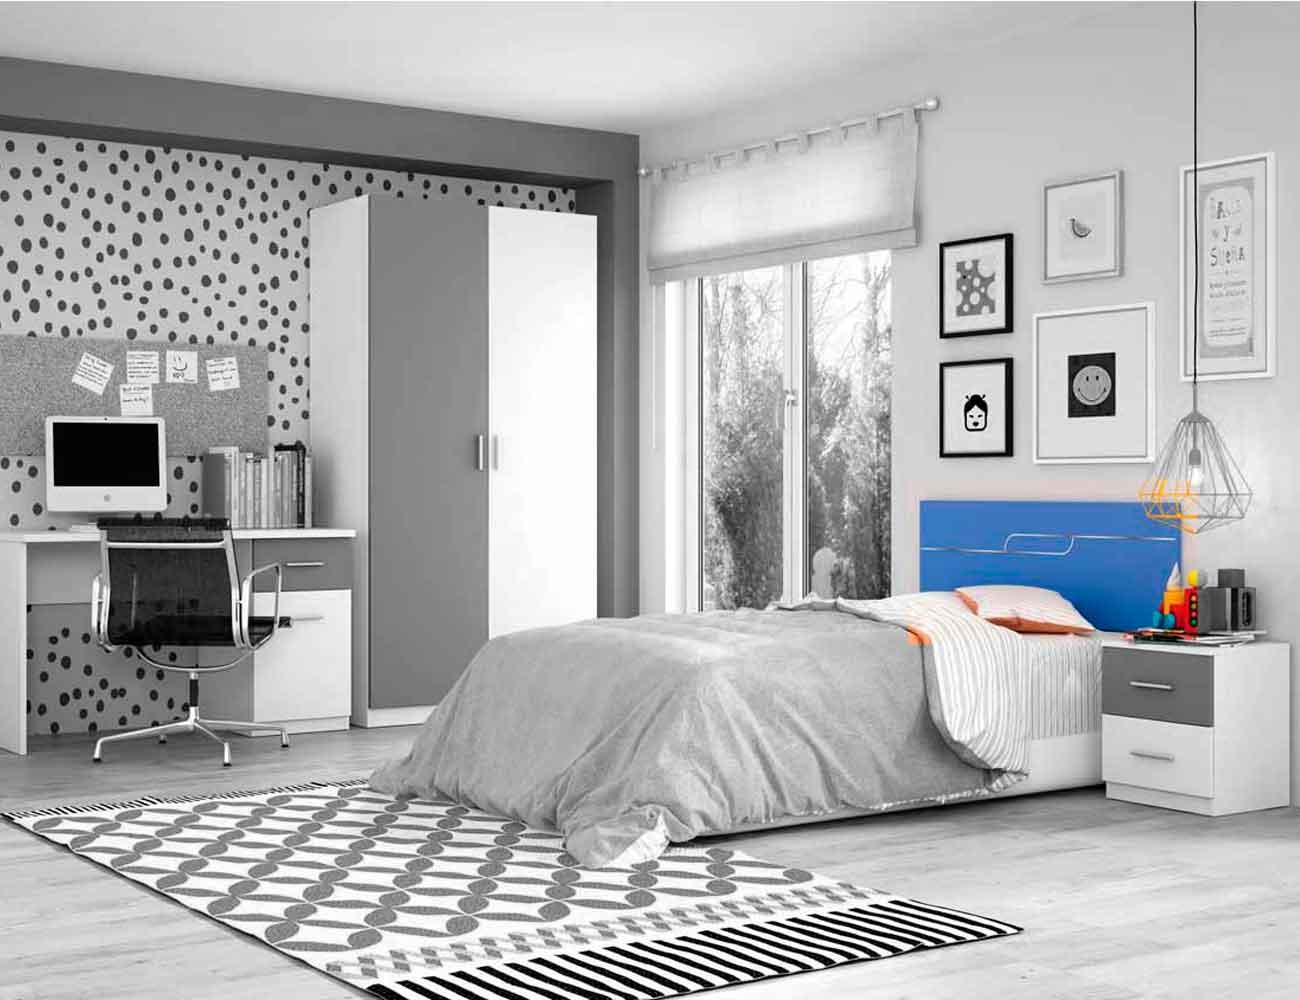 Dormitorio juvenil cabecero 110 cm